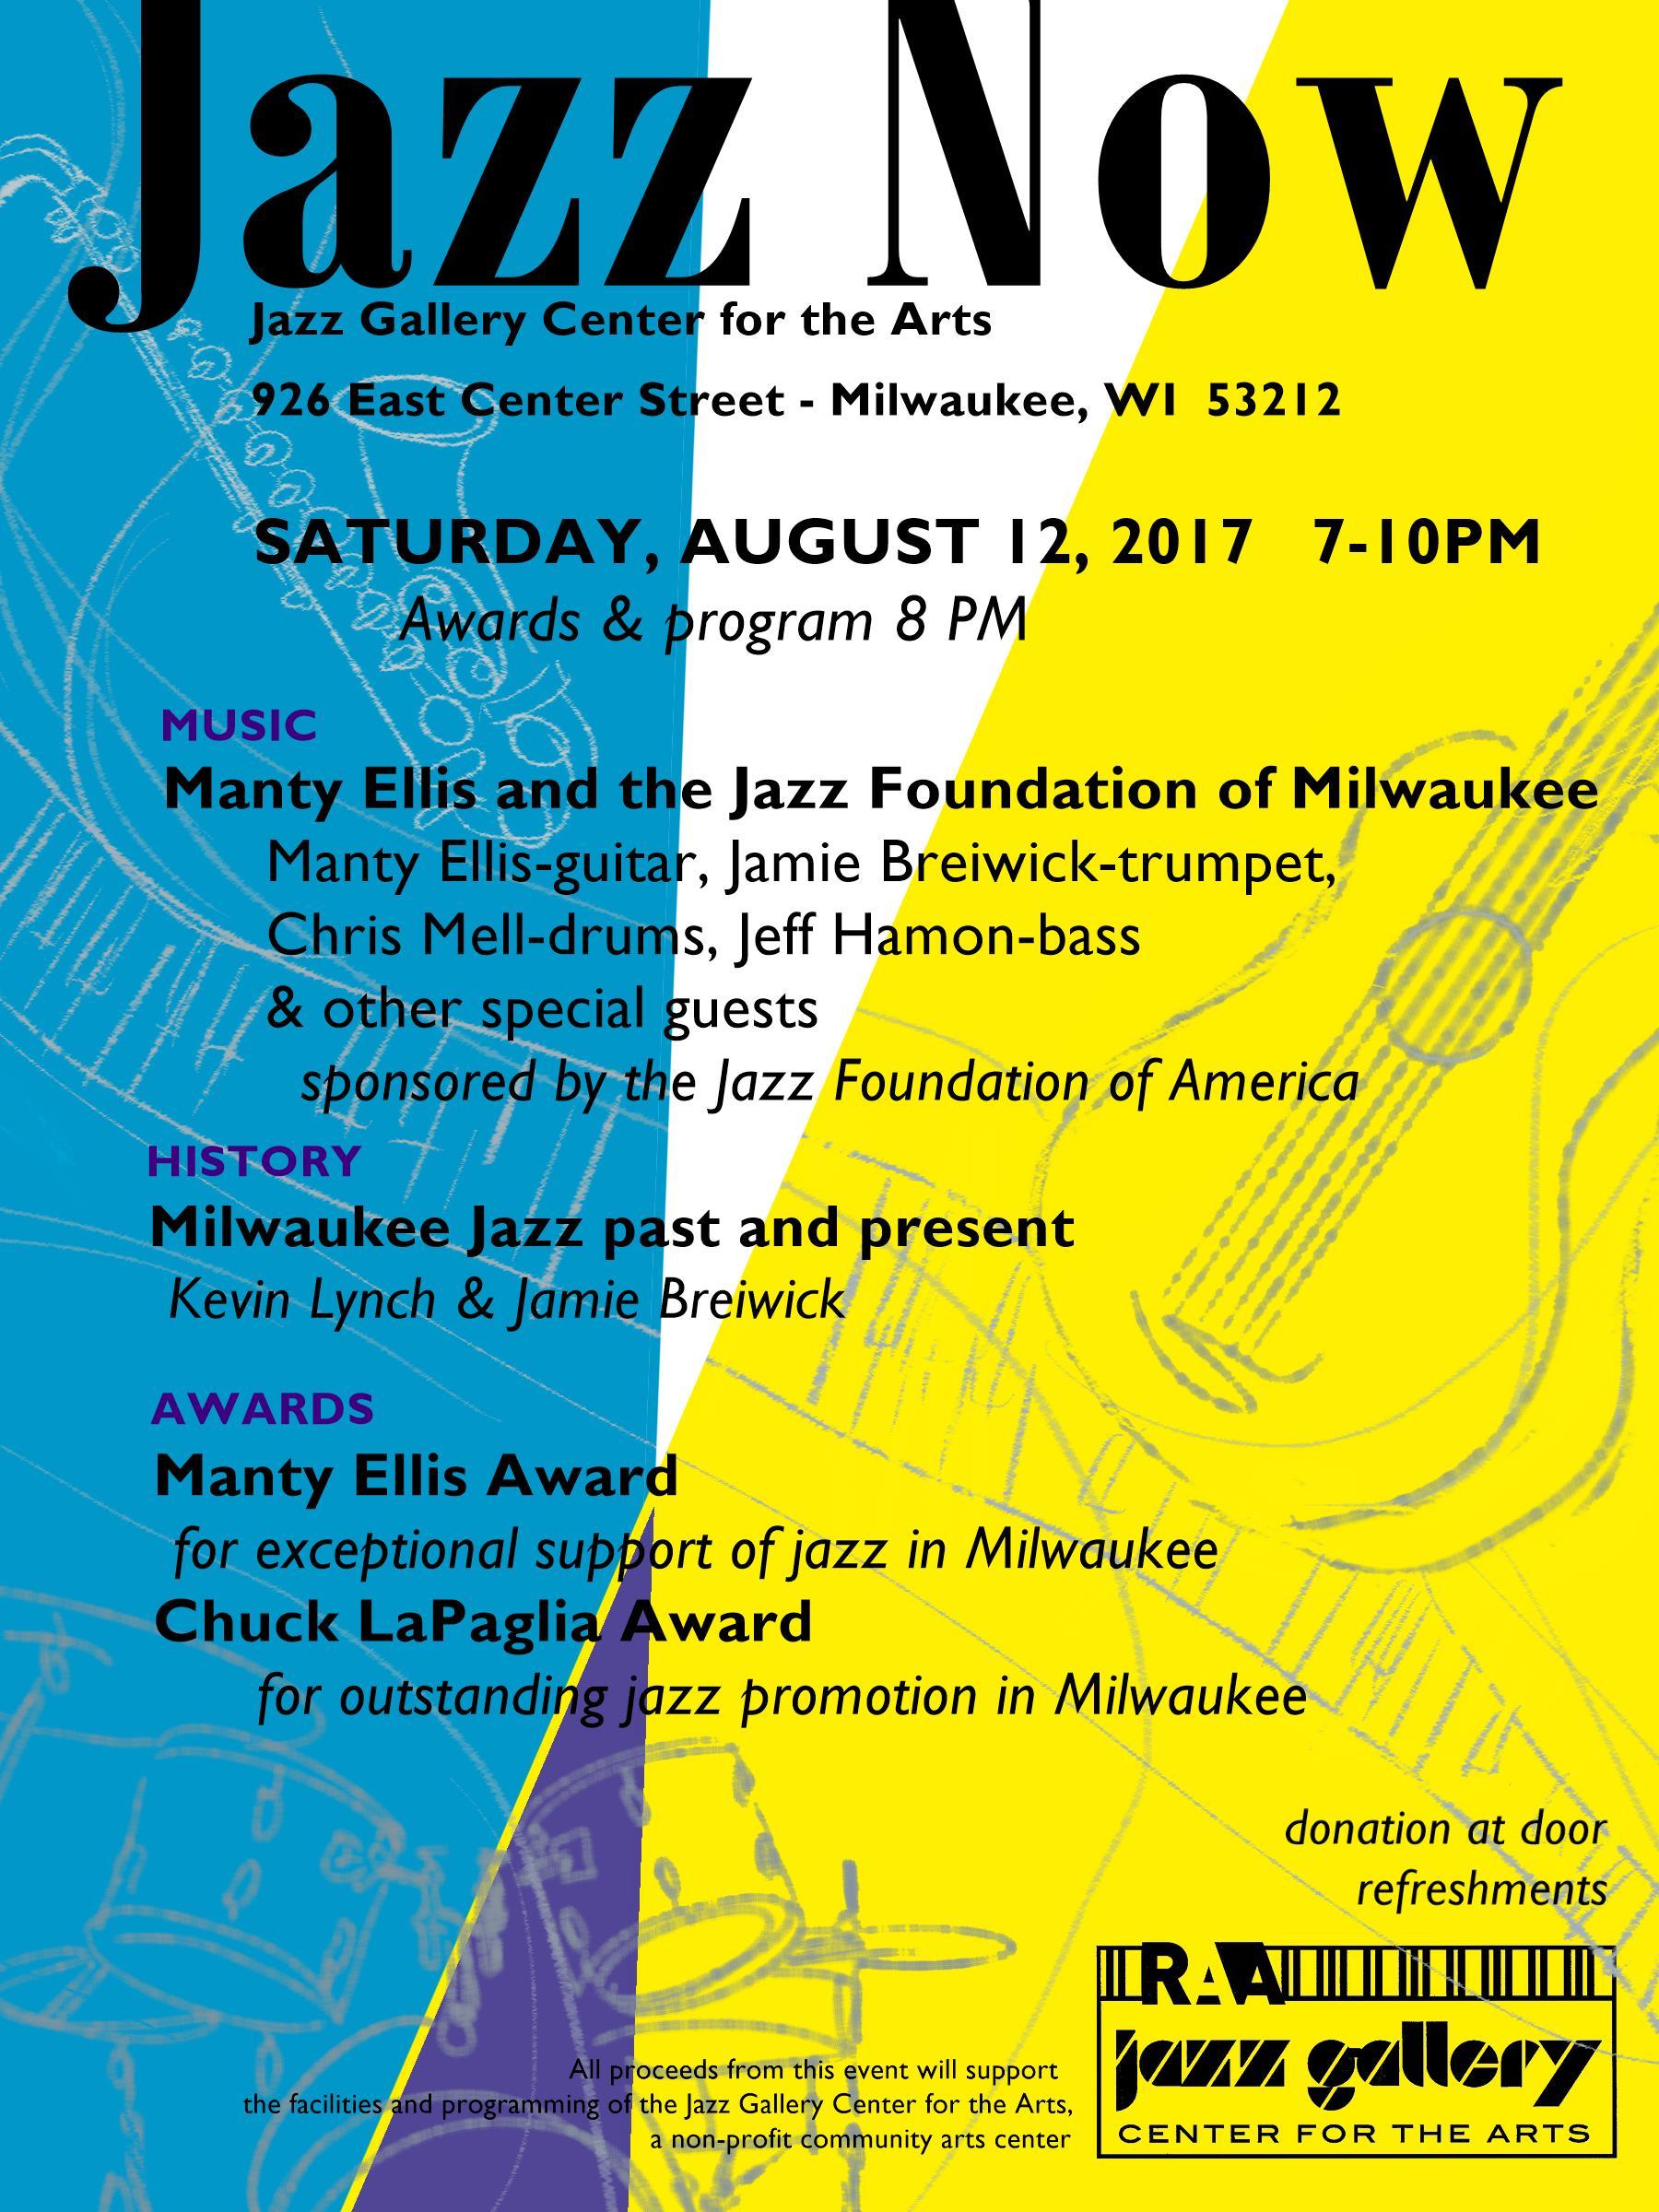 Jazz Now event poster II